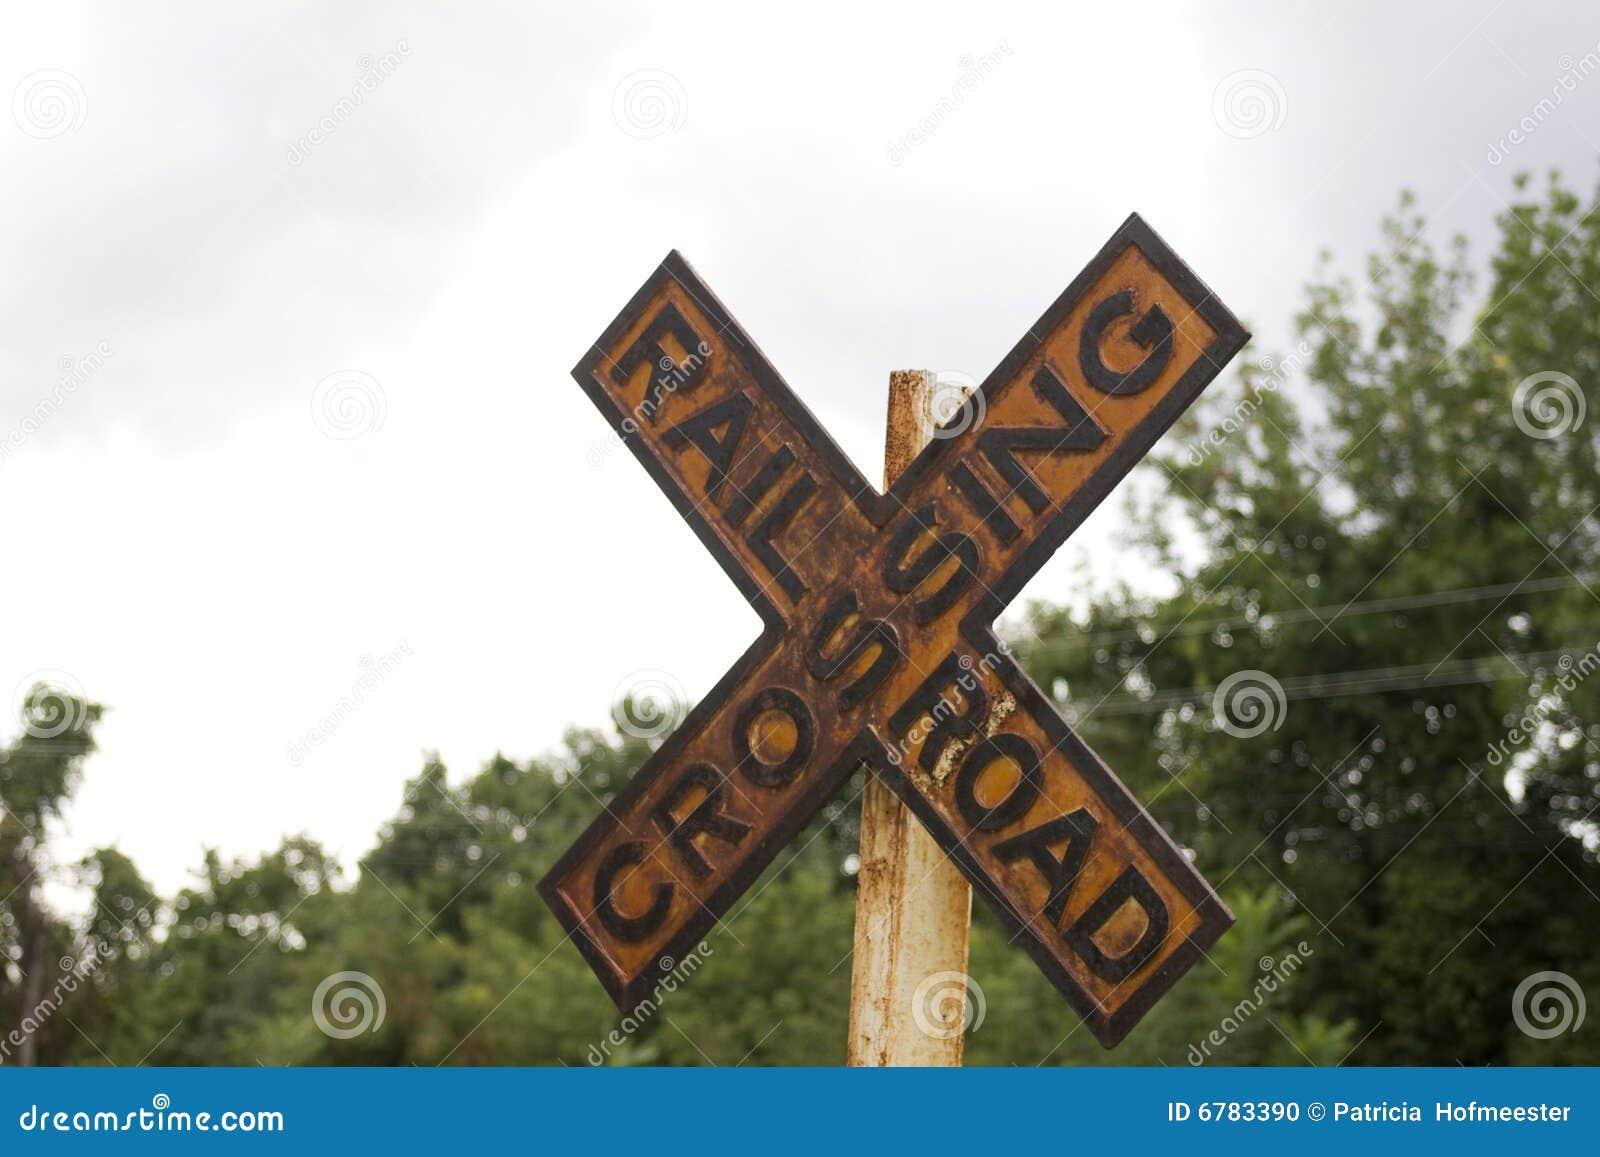 Railroad Crossing Clip Art Old railroad crossing sign